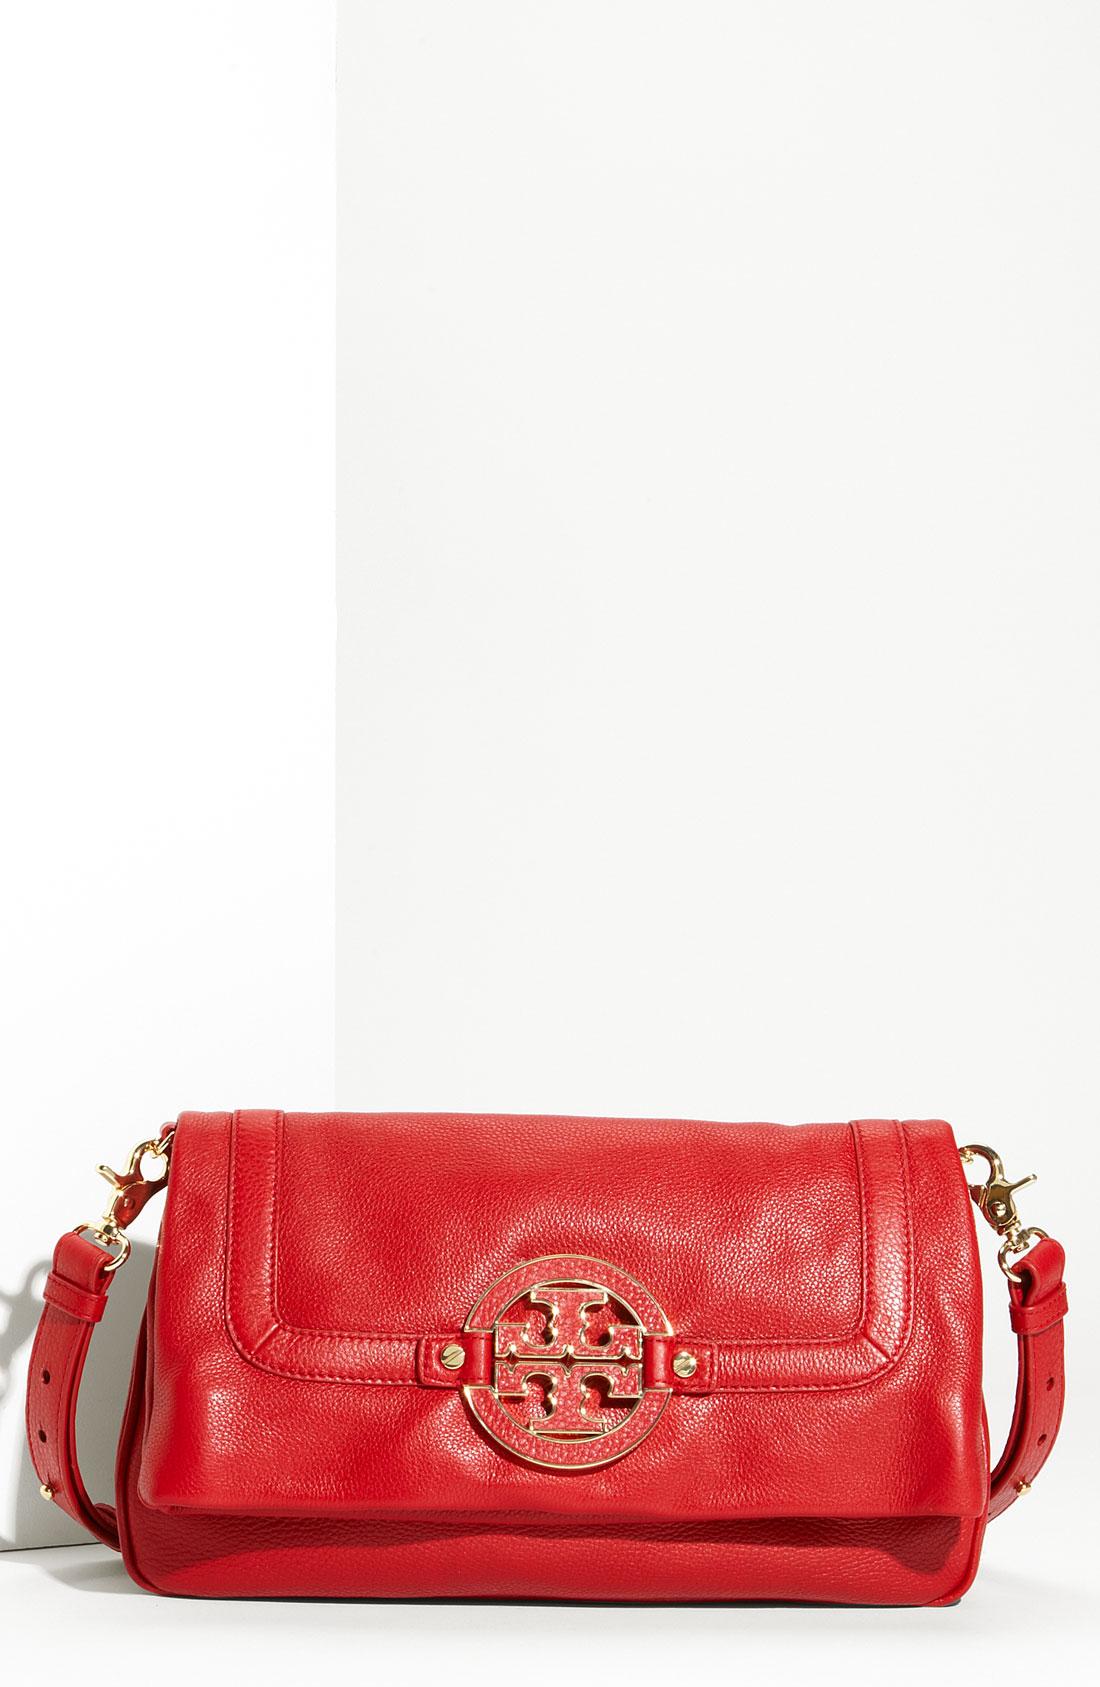 tory burch amanda logo flap crossbody bag in red french